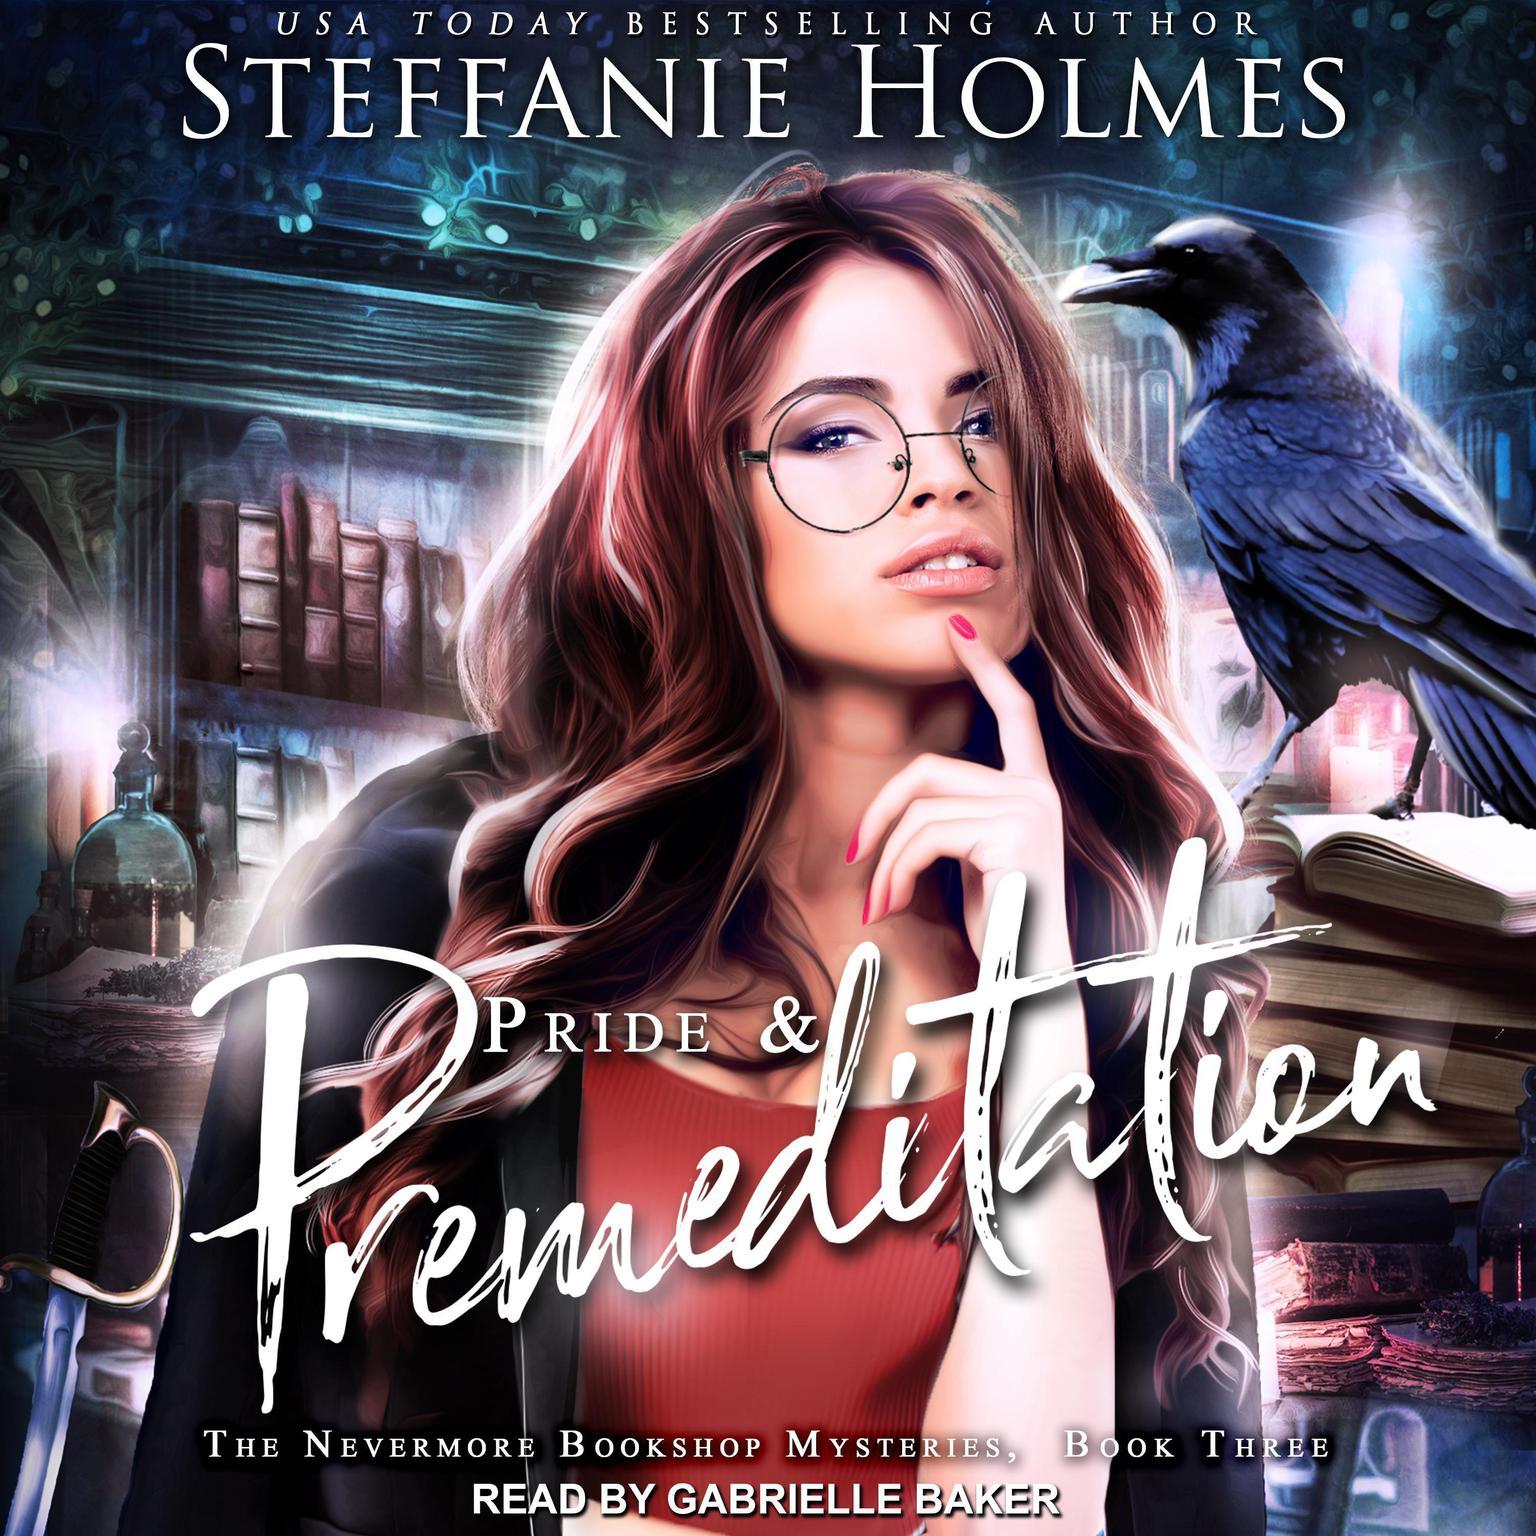 Printable Pride and Premeditation Audiobook Cover Art